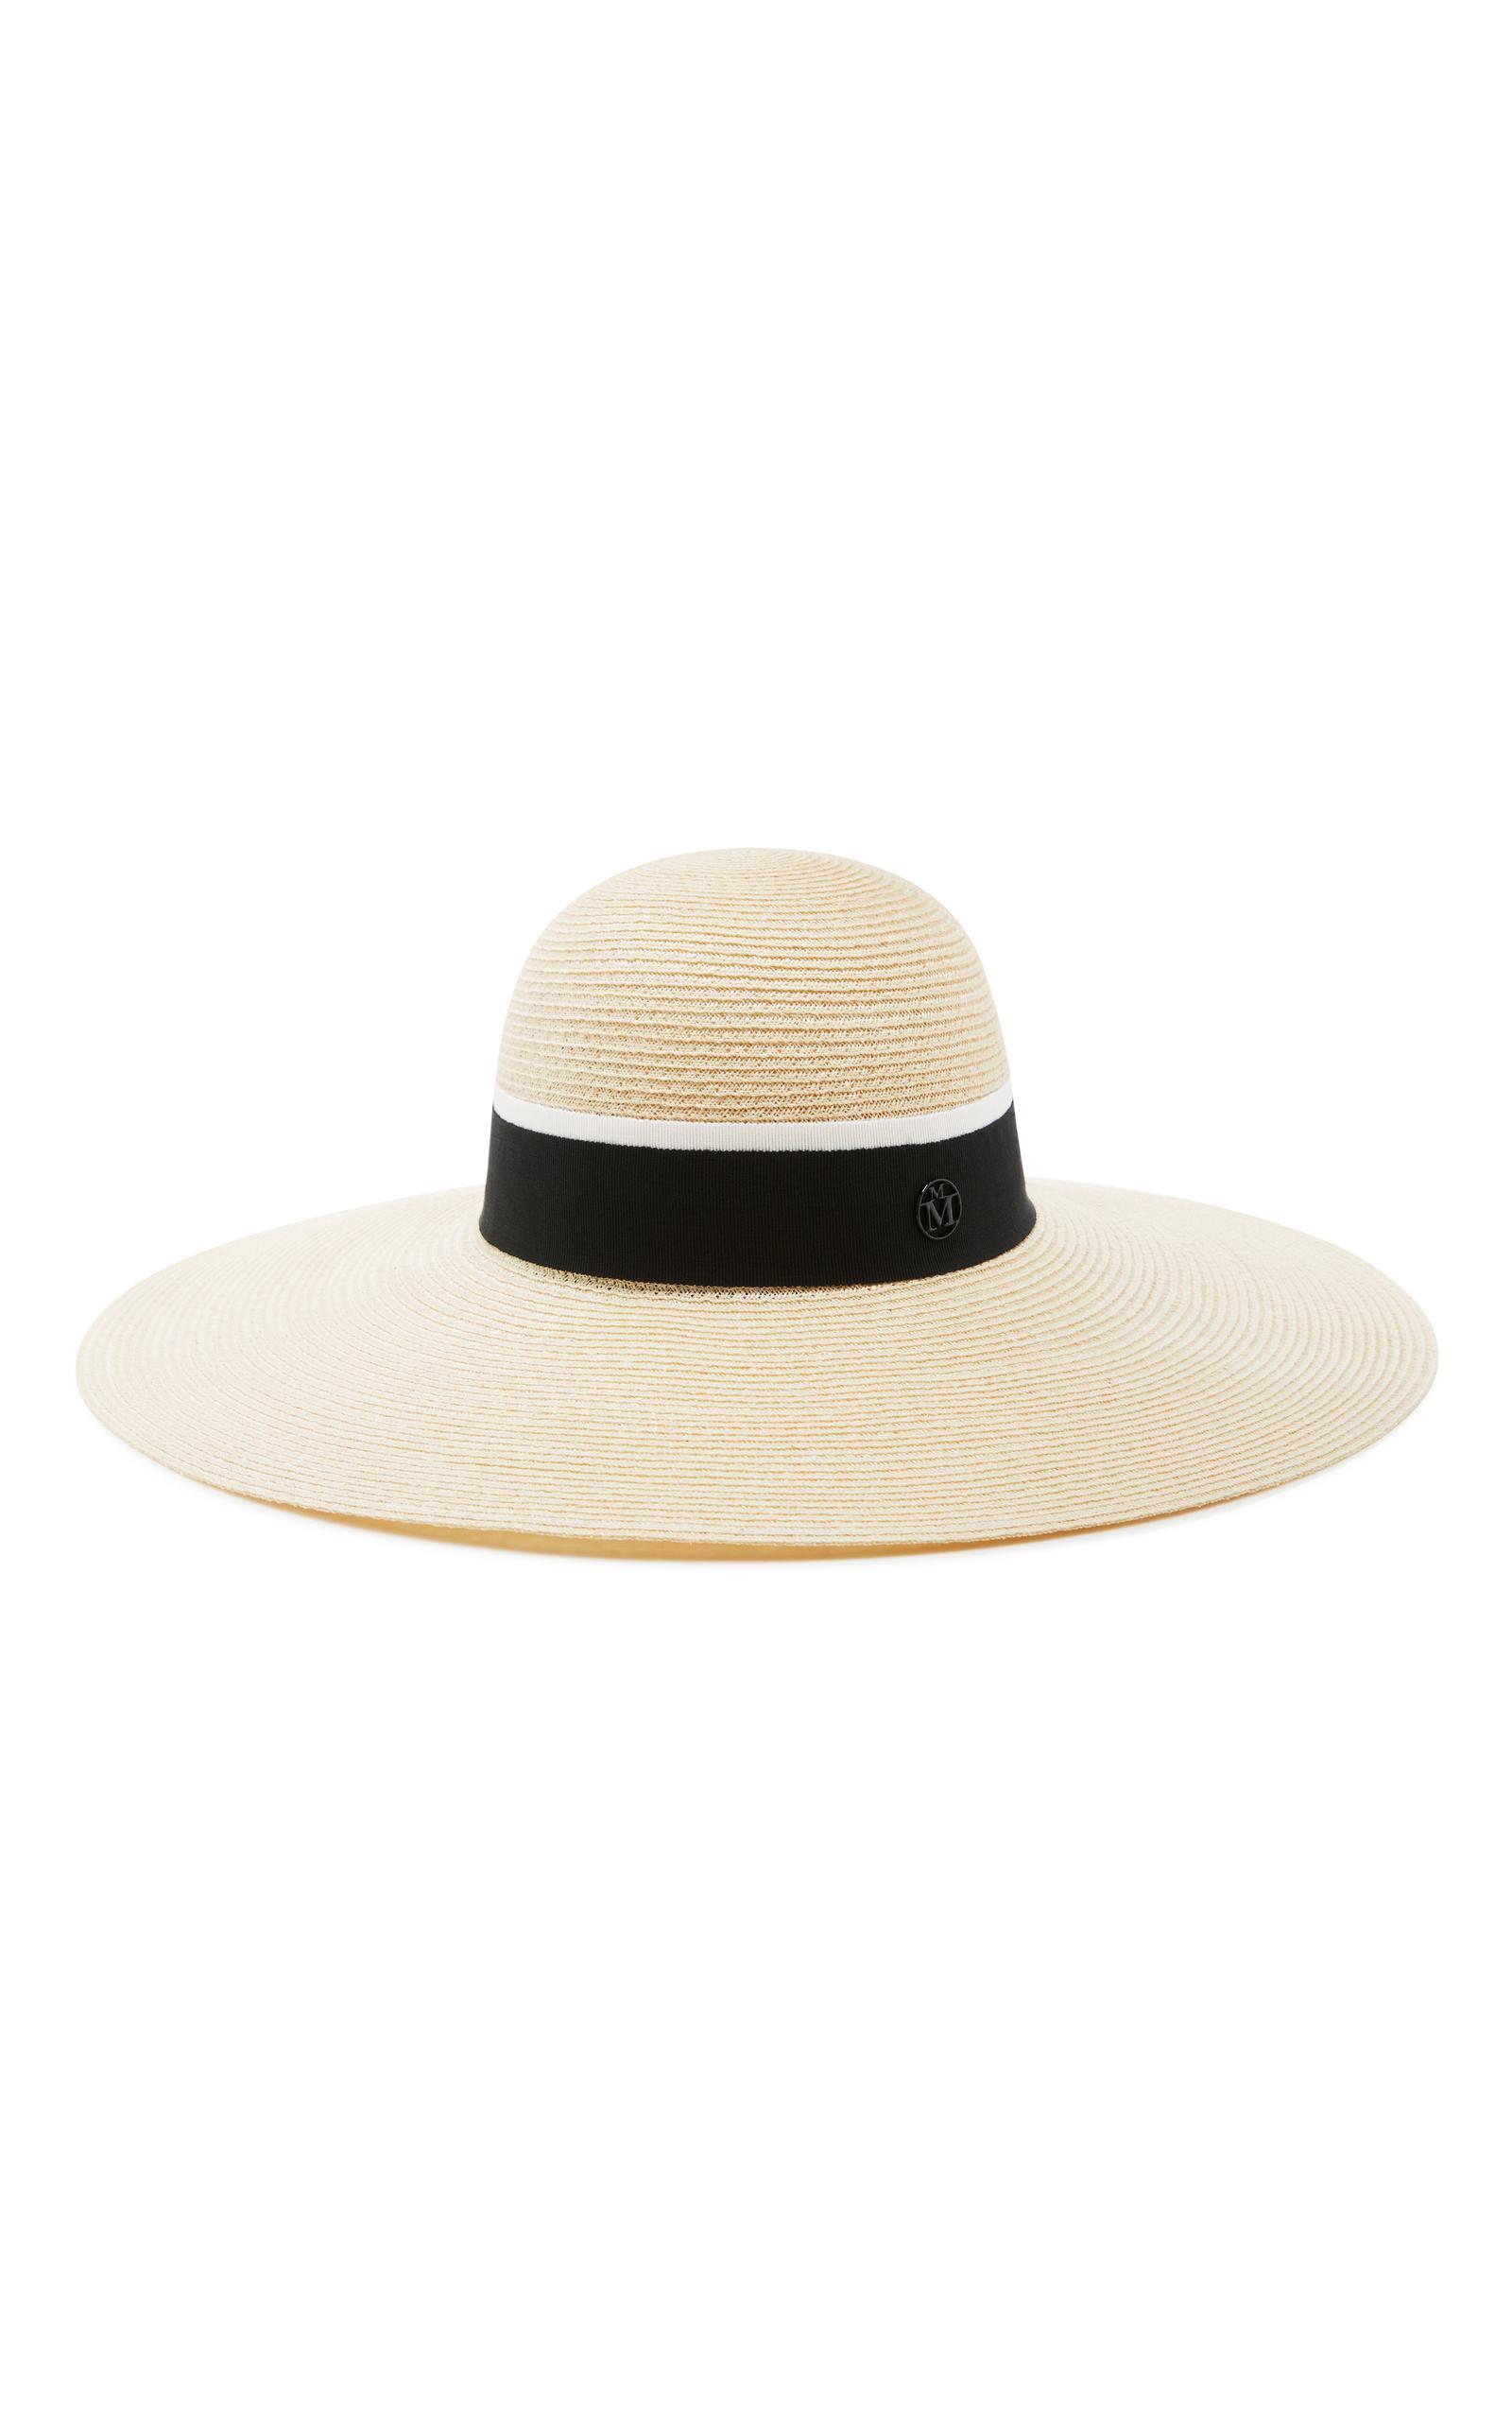 Canapa straw hat - Blue Maison Michel WDwHKM1